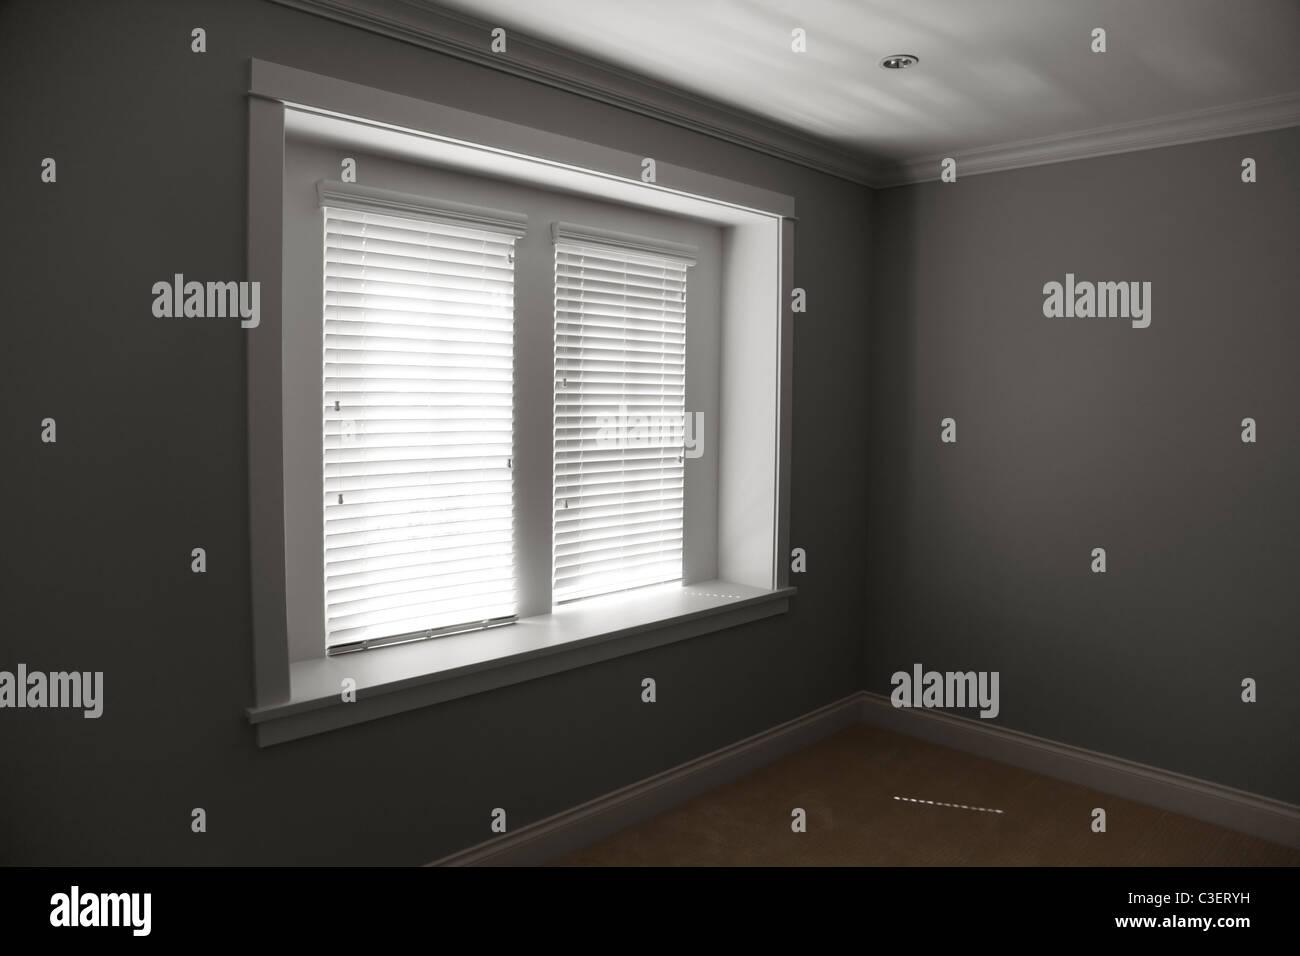 Bedroom indooor for background - Stock Image